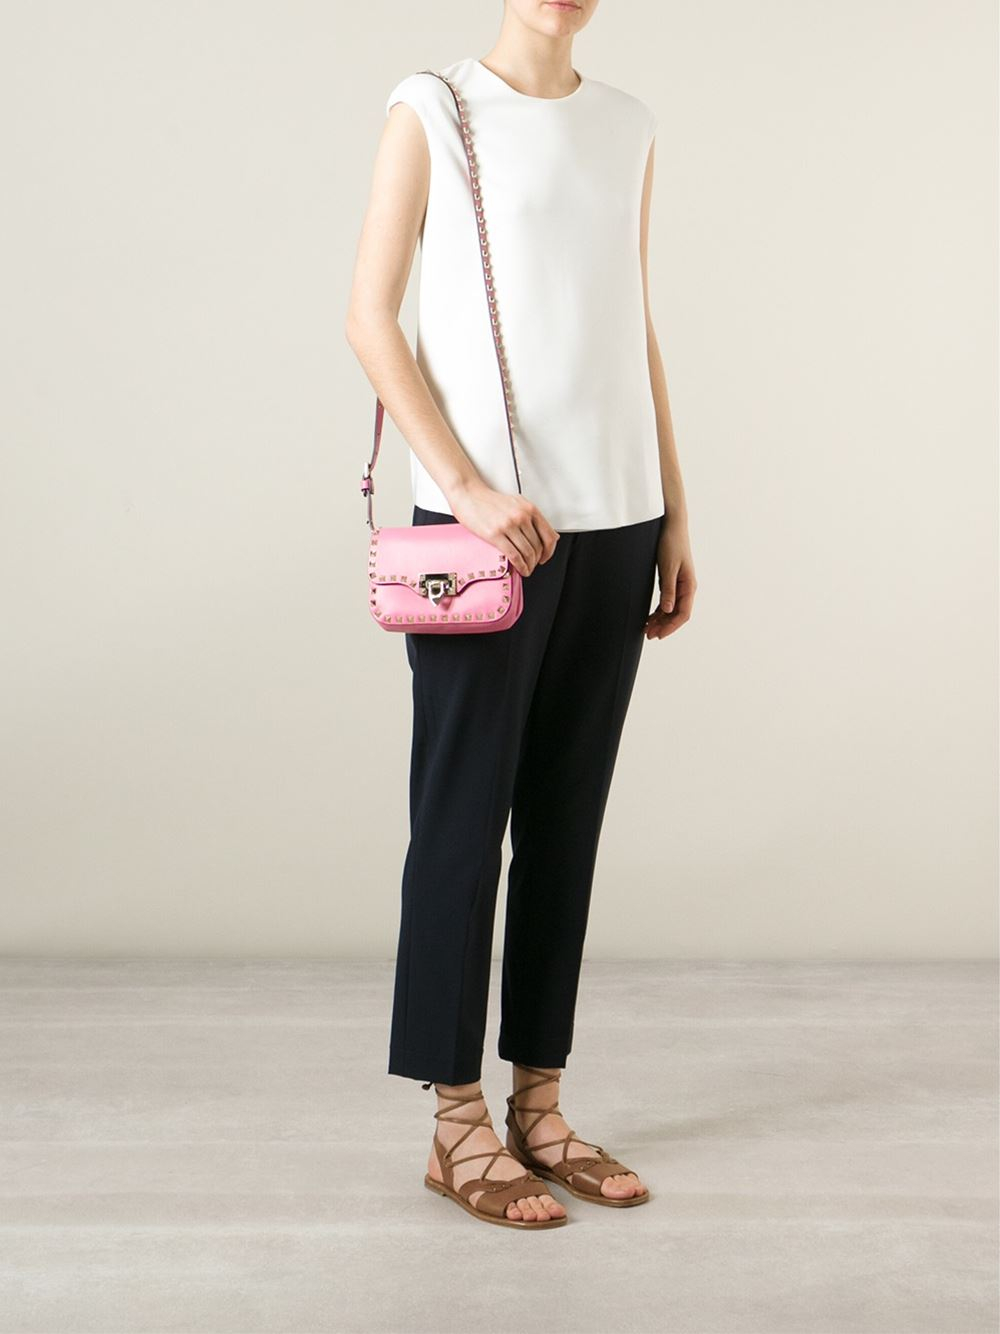 79a13edf03da Gallery. Previously sold at: Farfetch · Women's Valentino Rockstud Bags